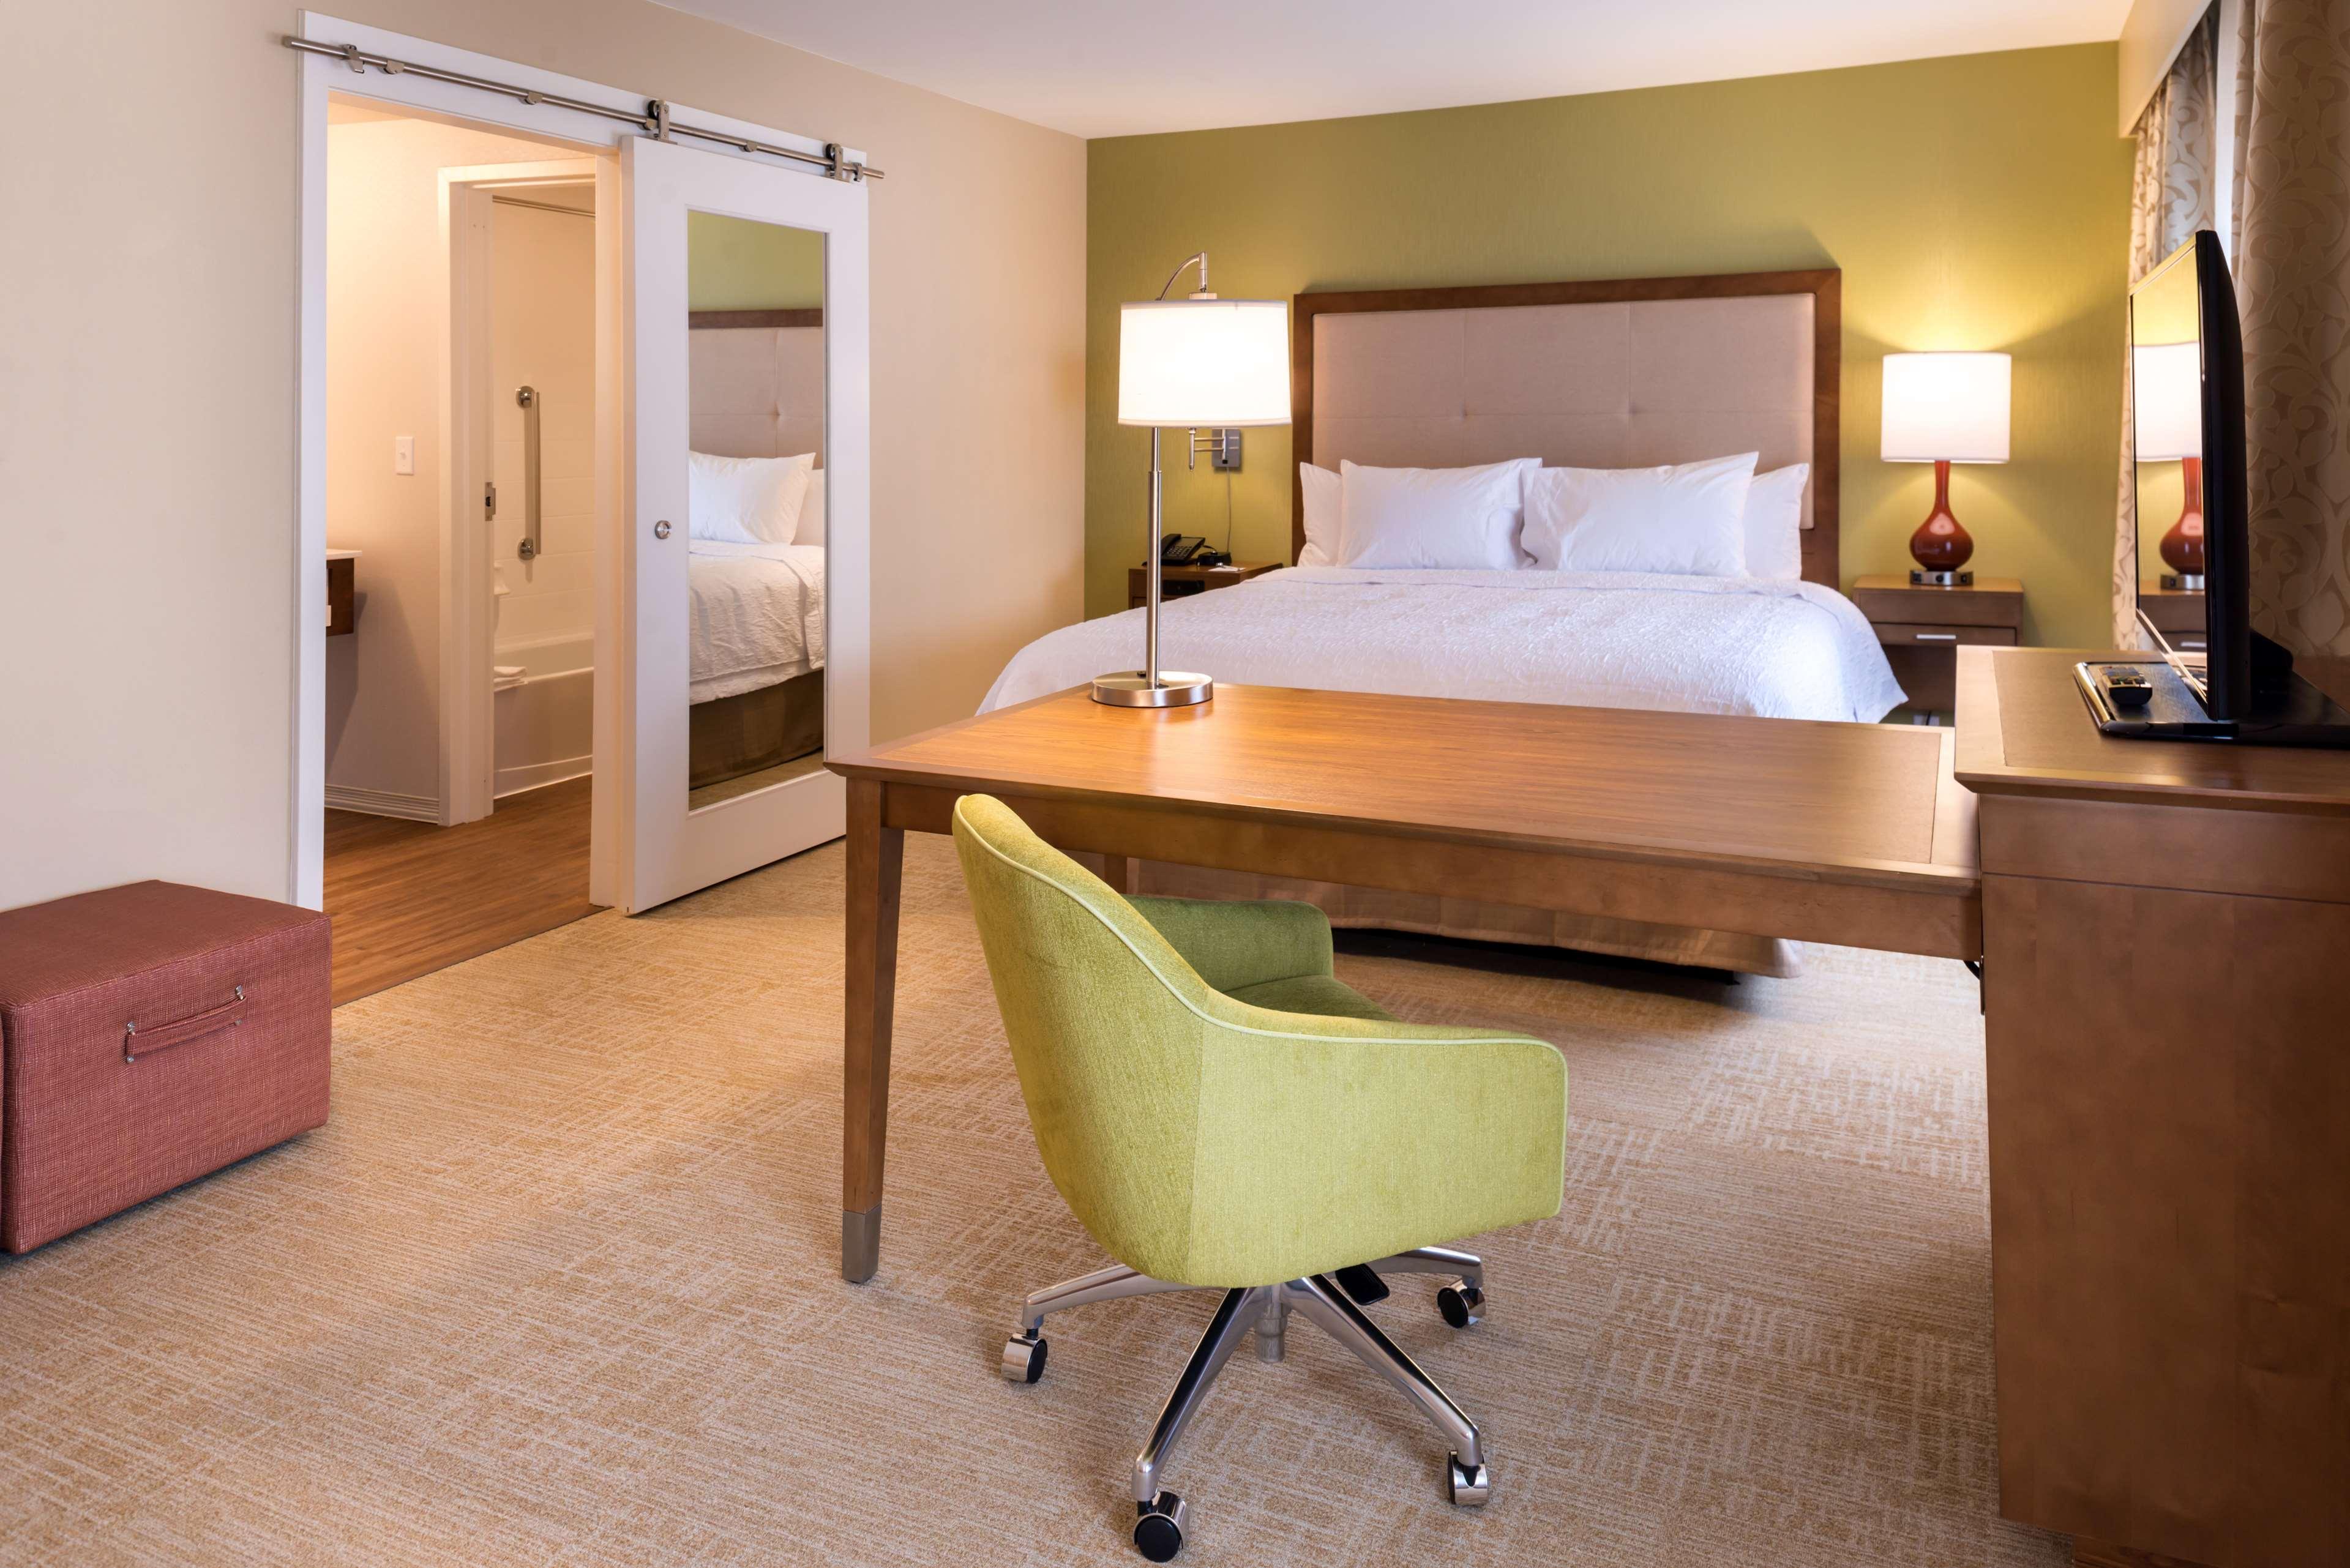 Hampton Inn & Suites Silverthorne image 16